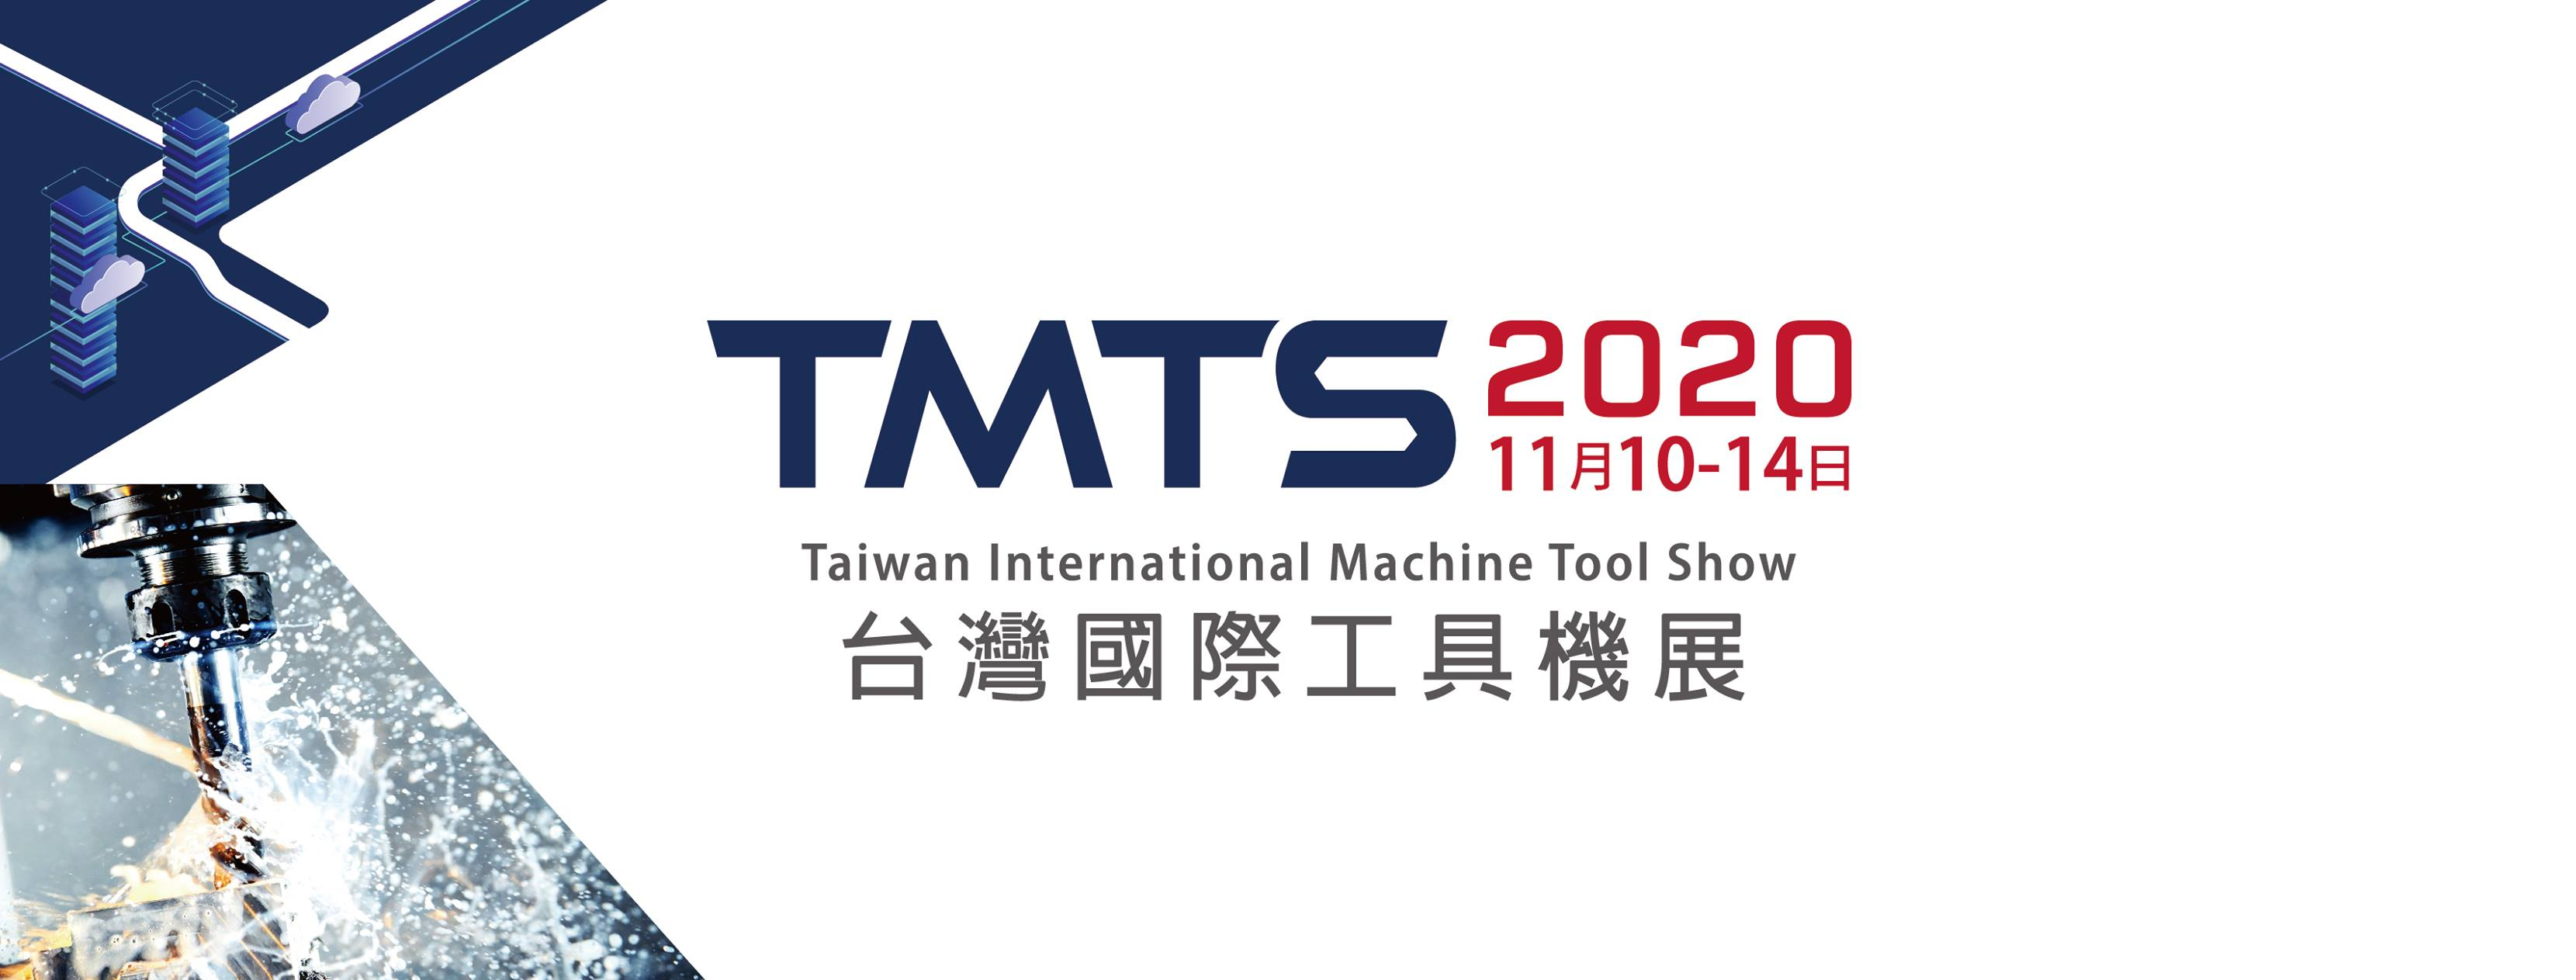 Taiwan International Machine Tool Show 2020